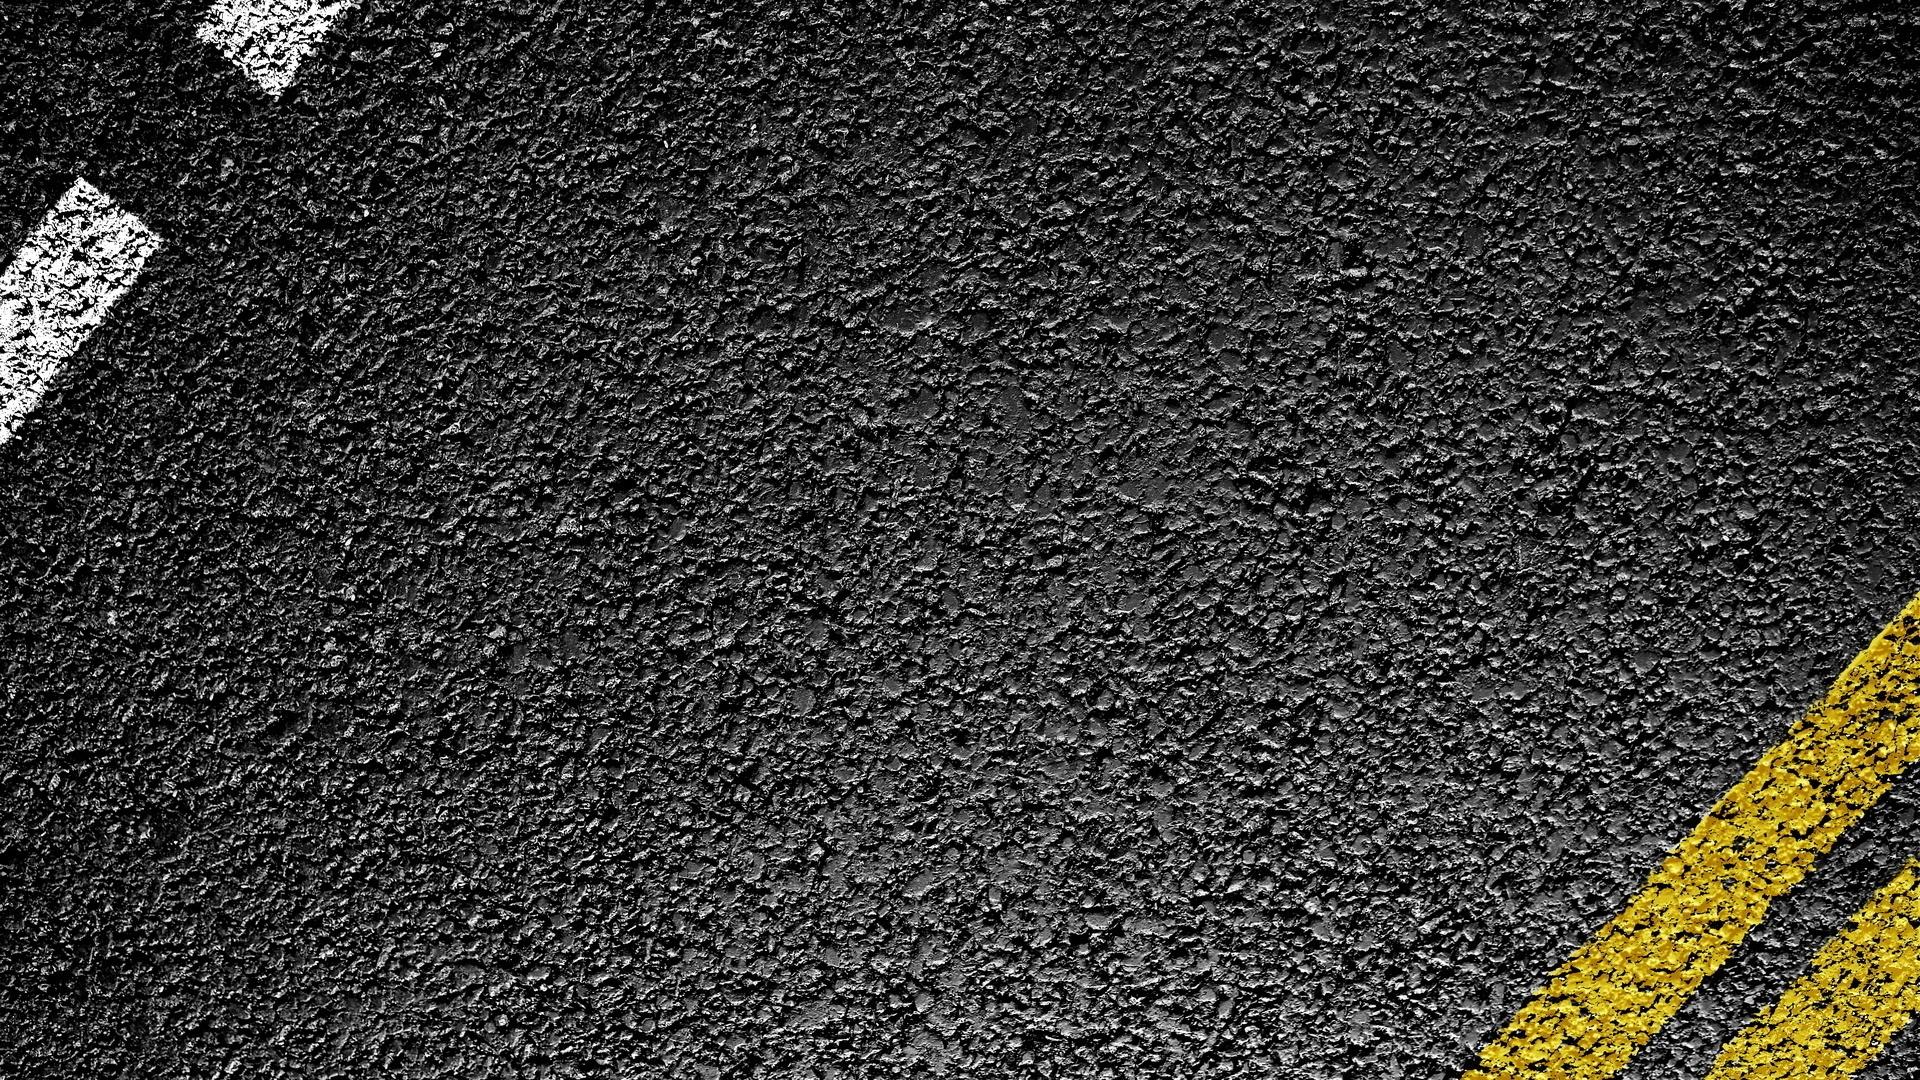 Black Road Pattern Texture Circle Carpet Asphalt Design Floor Line Soil Flooring Surface Marking